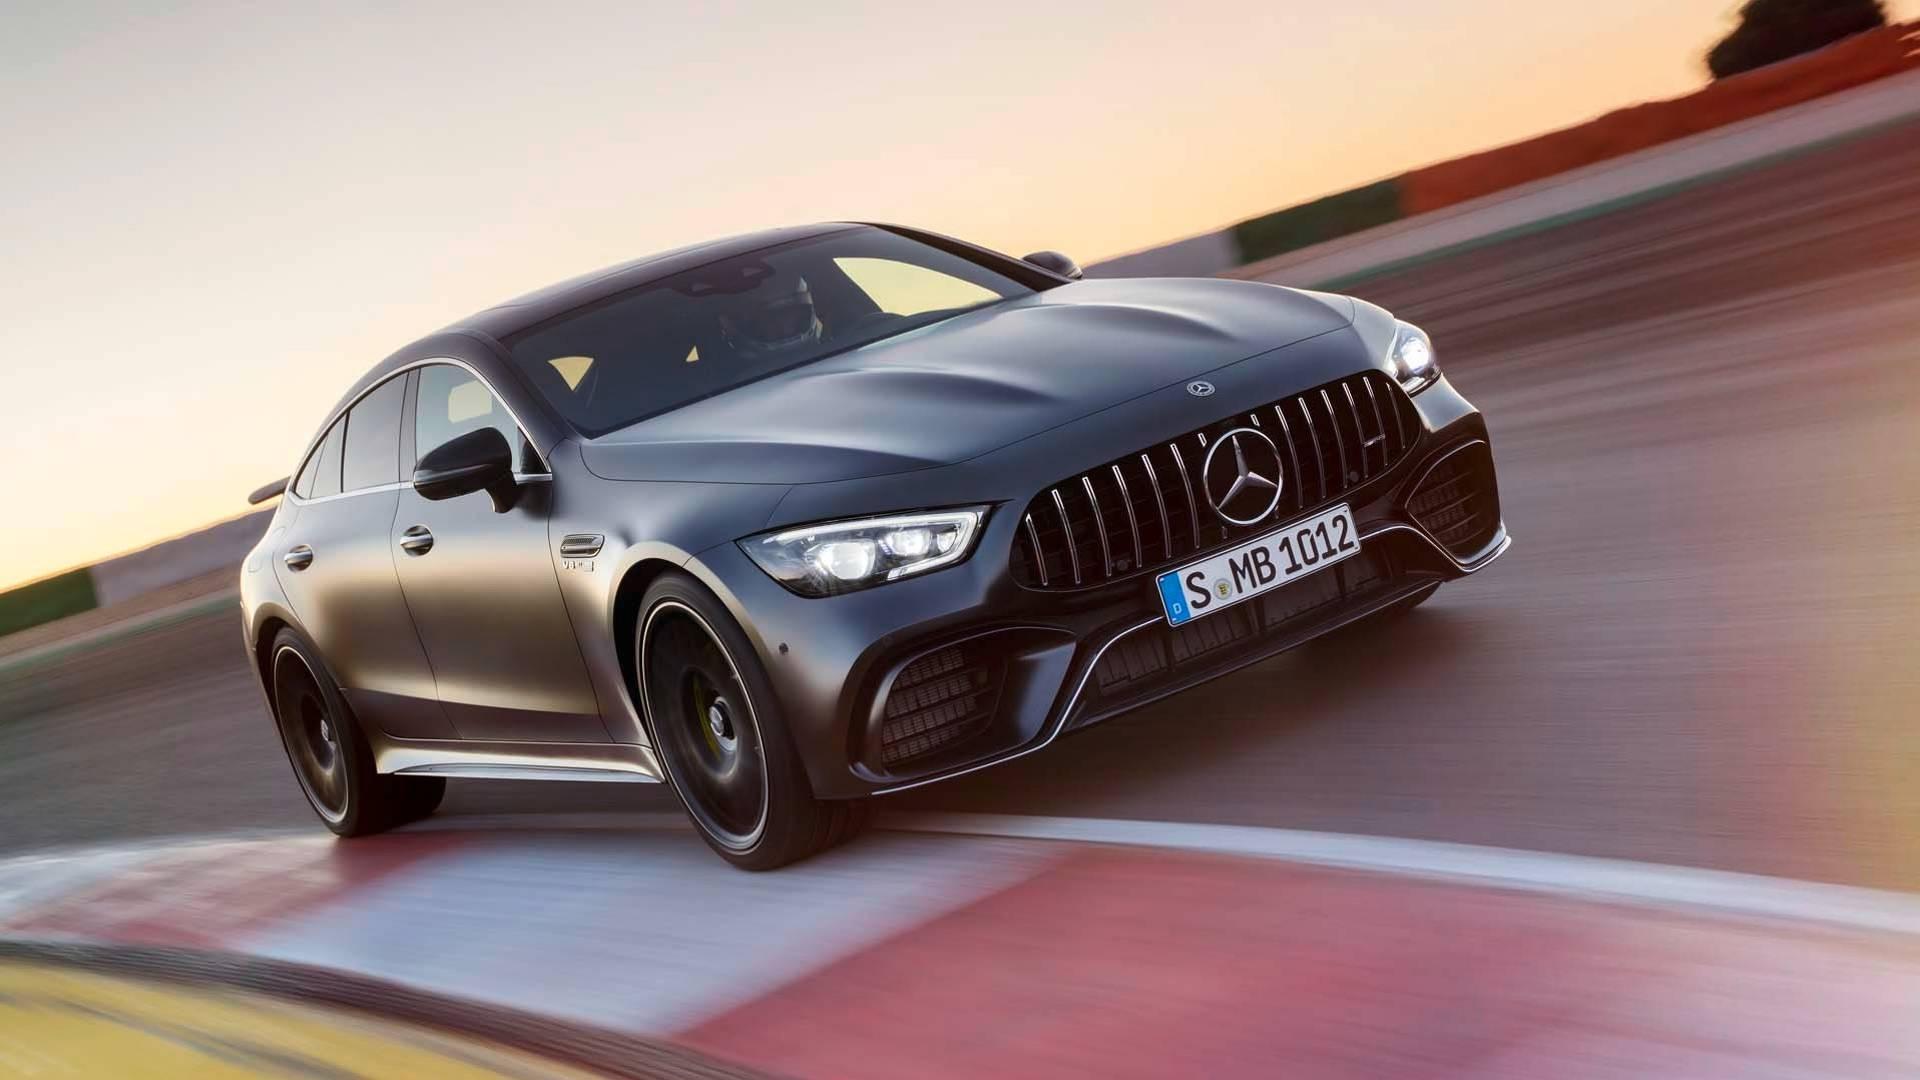 Premijera: Mercedes AMG GT (galerija)